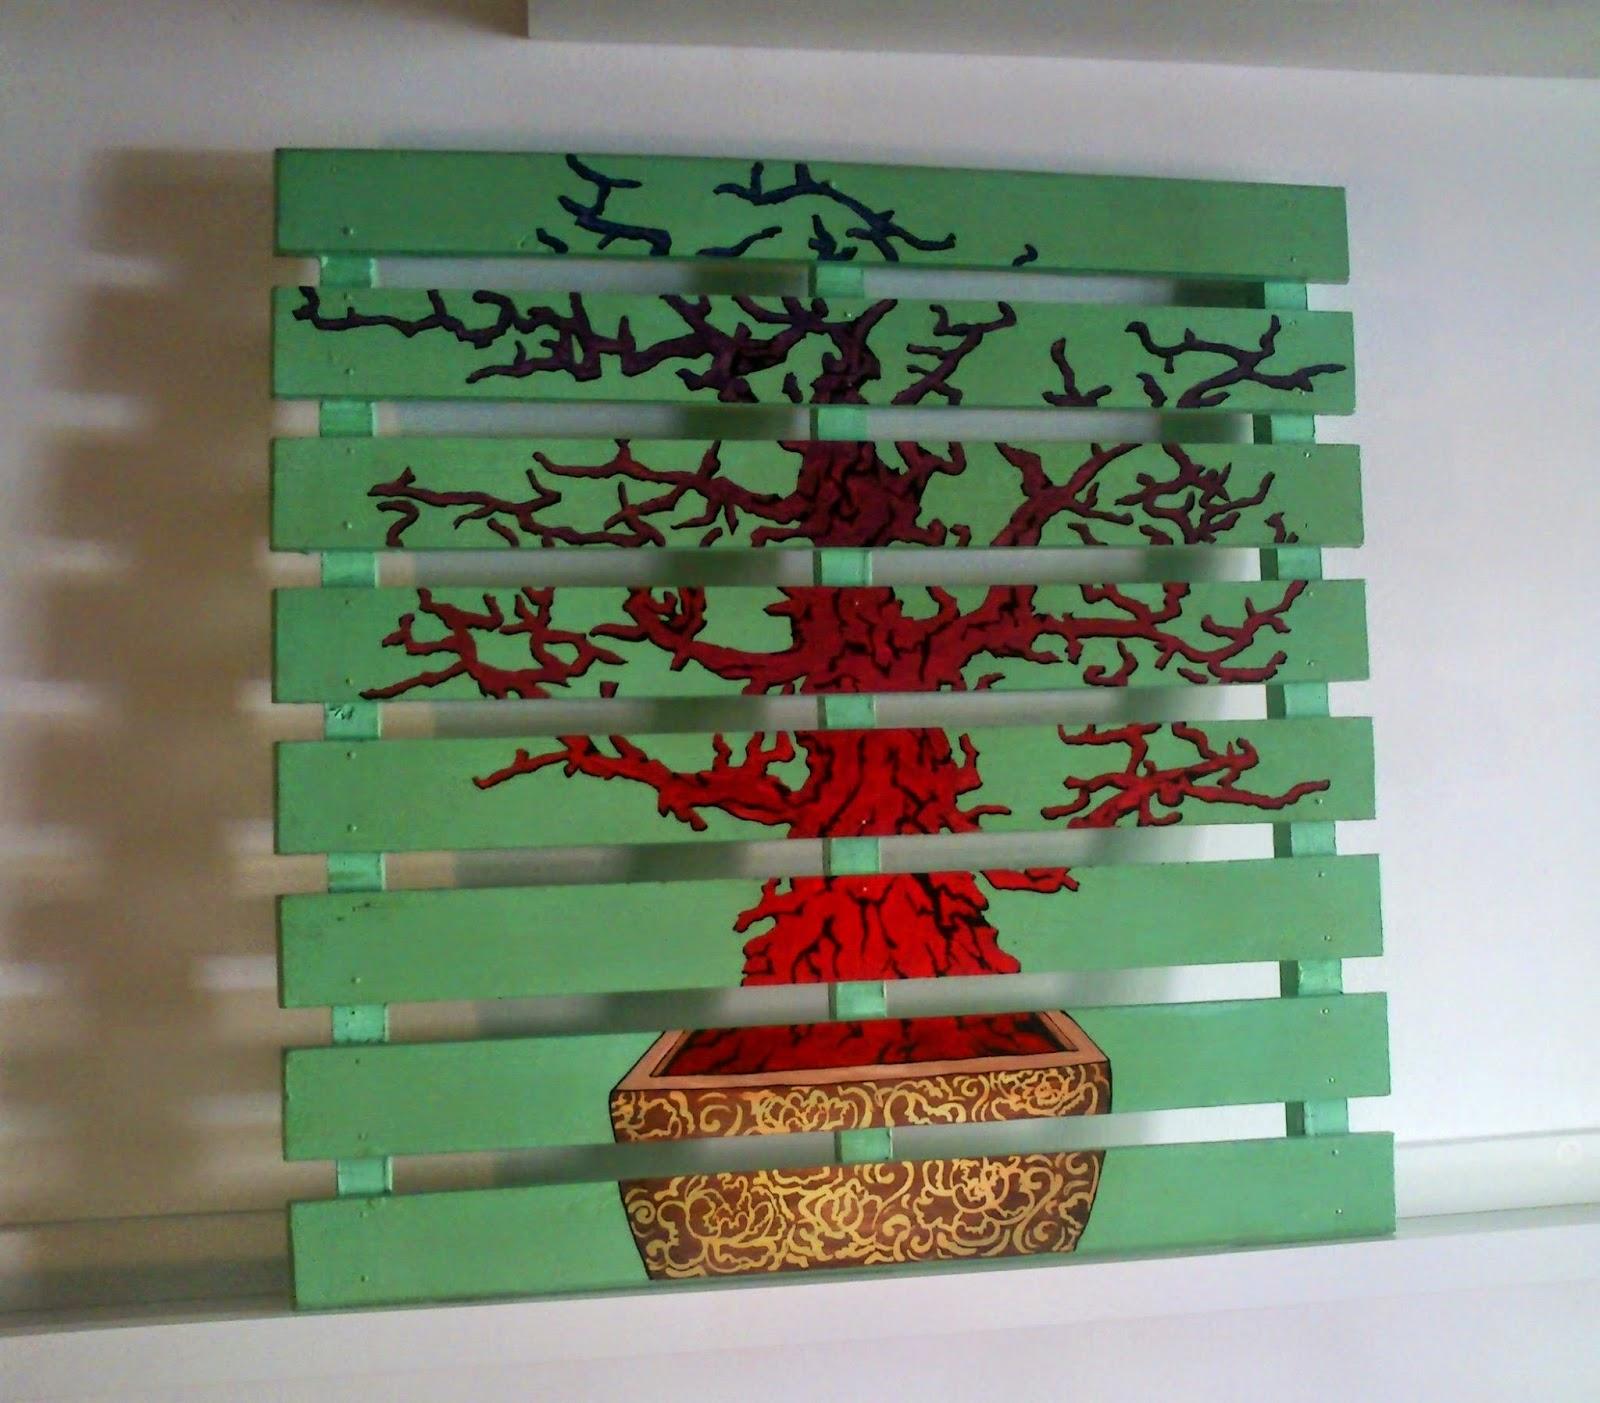 Chipi artesan a customizaci n de muebles de madera y palets for Muebles pintados a mano fotos